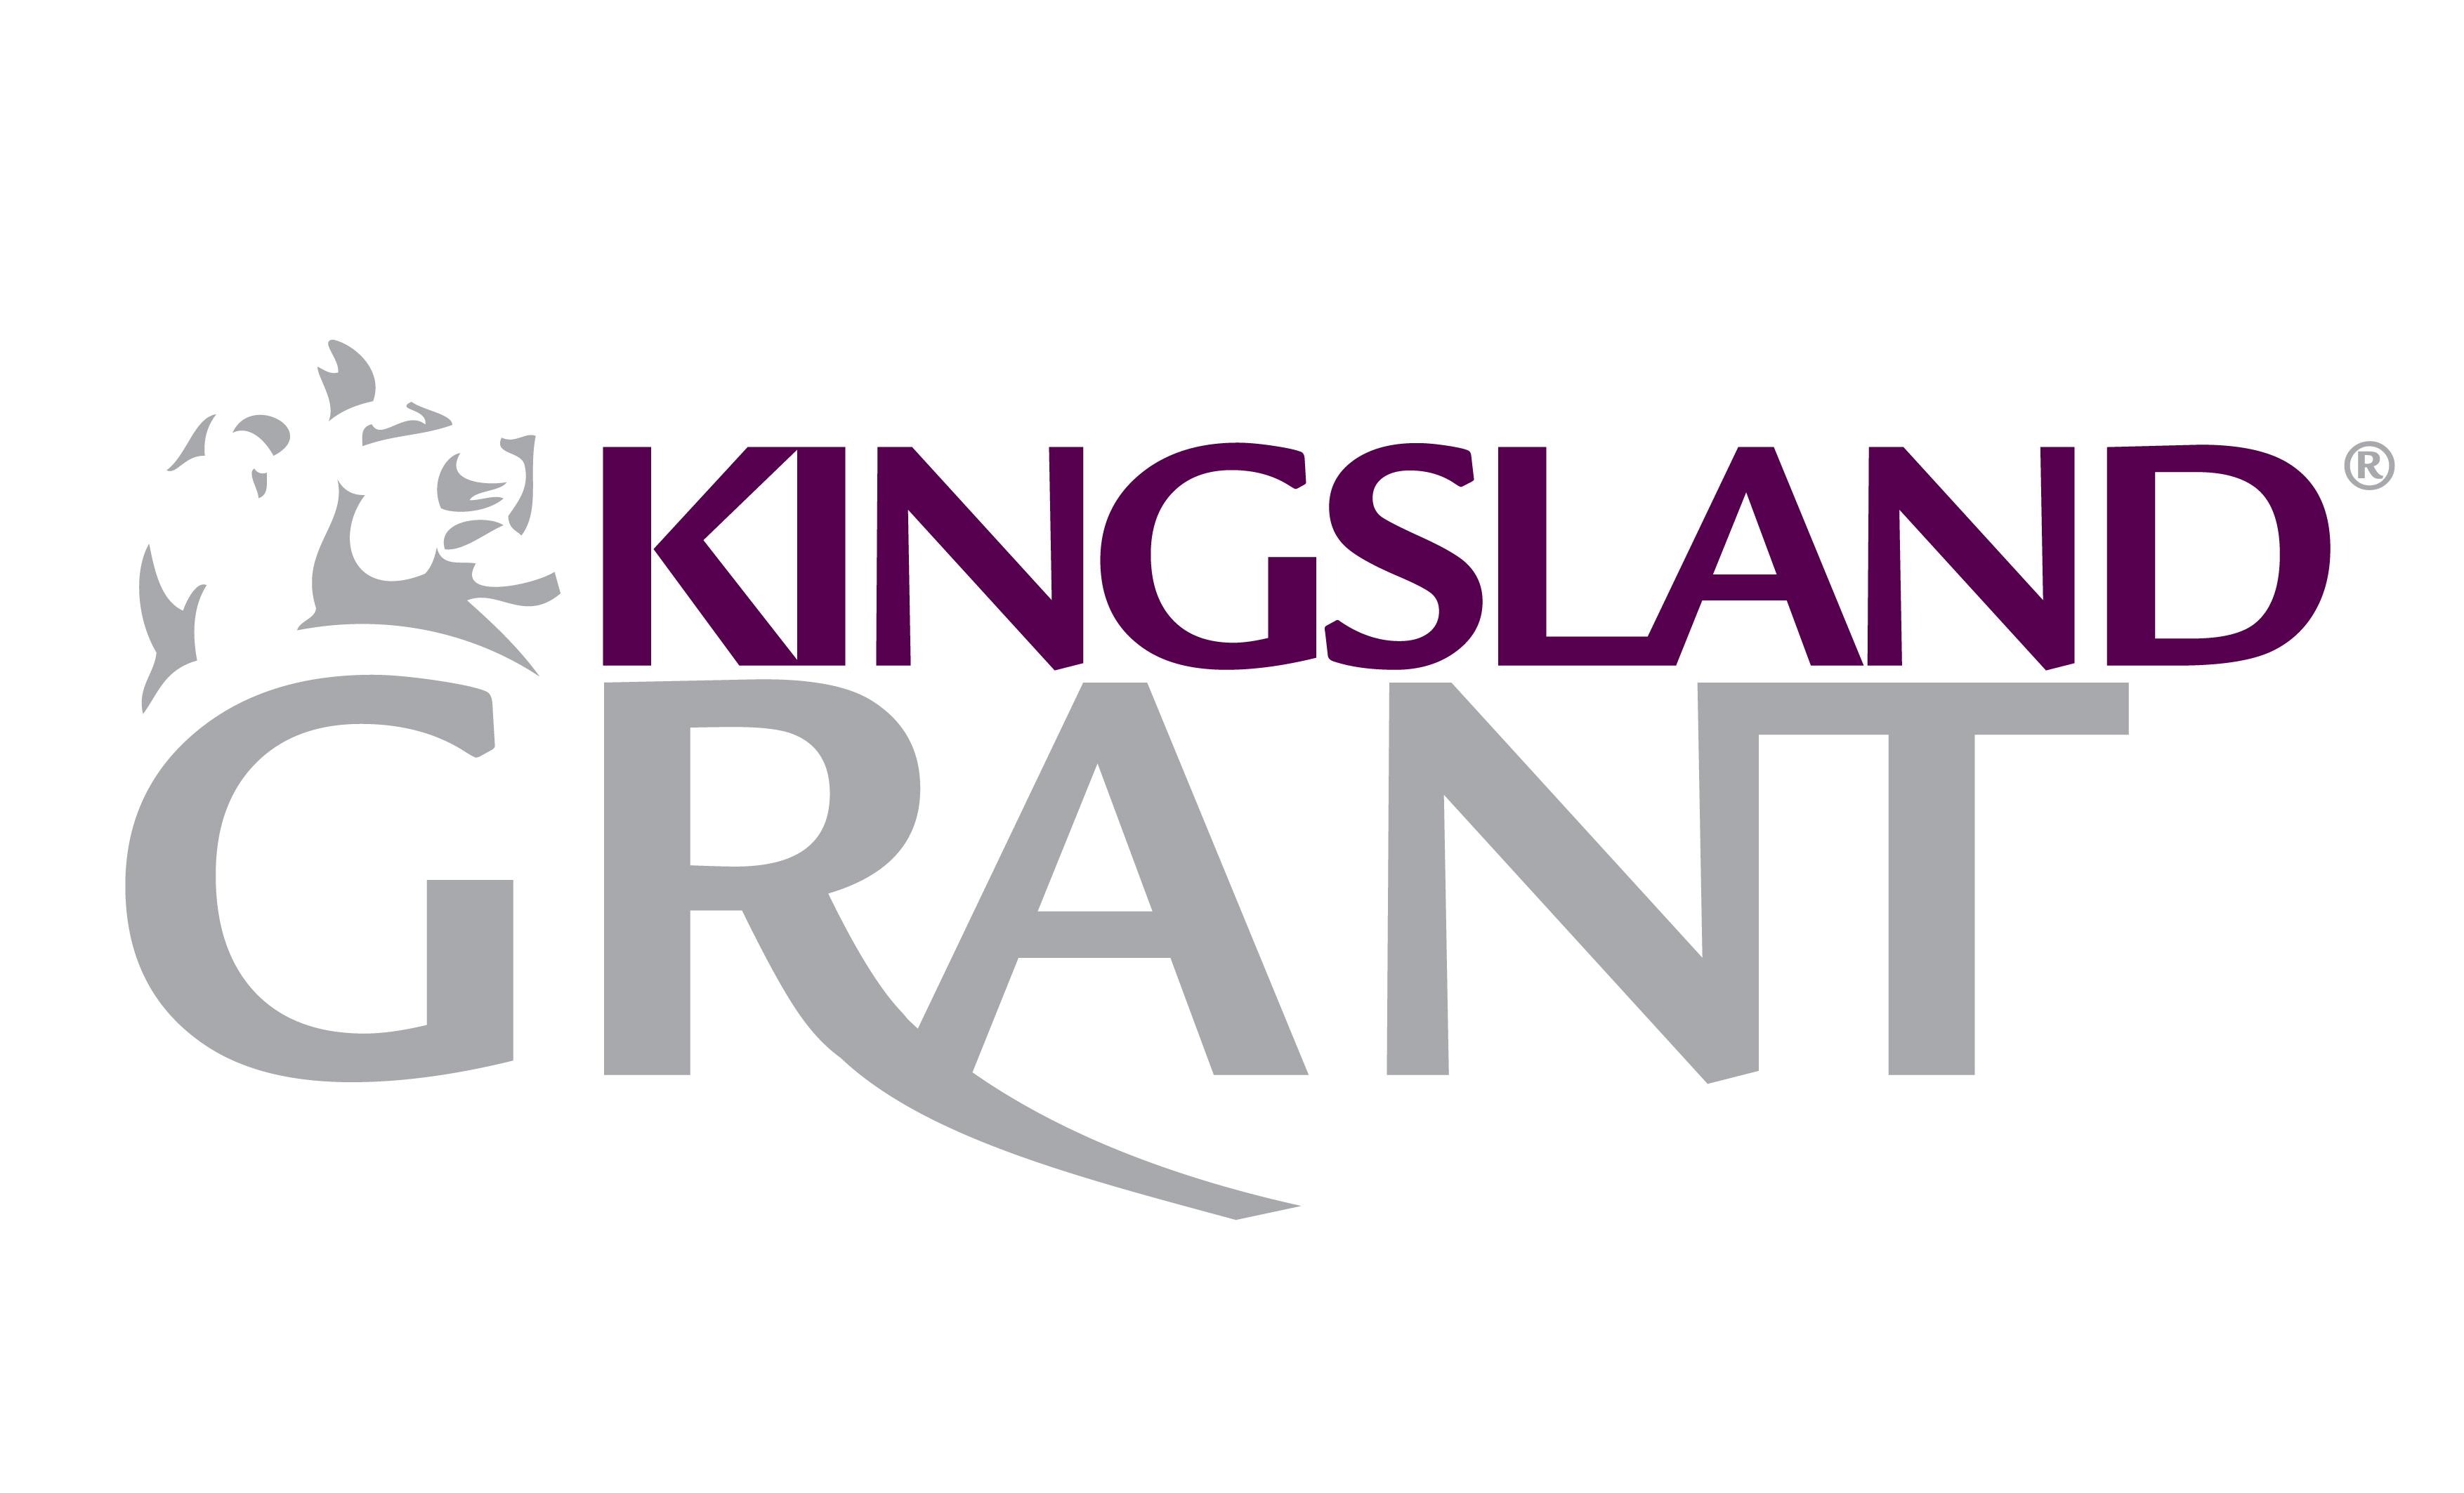 Kingsland Grant